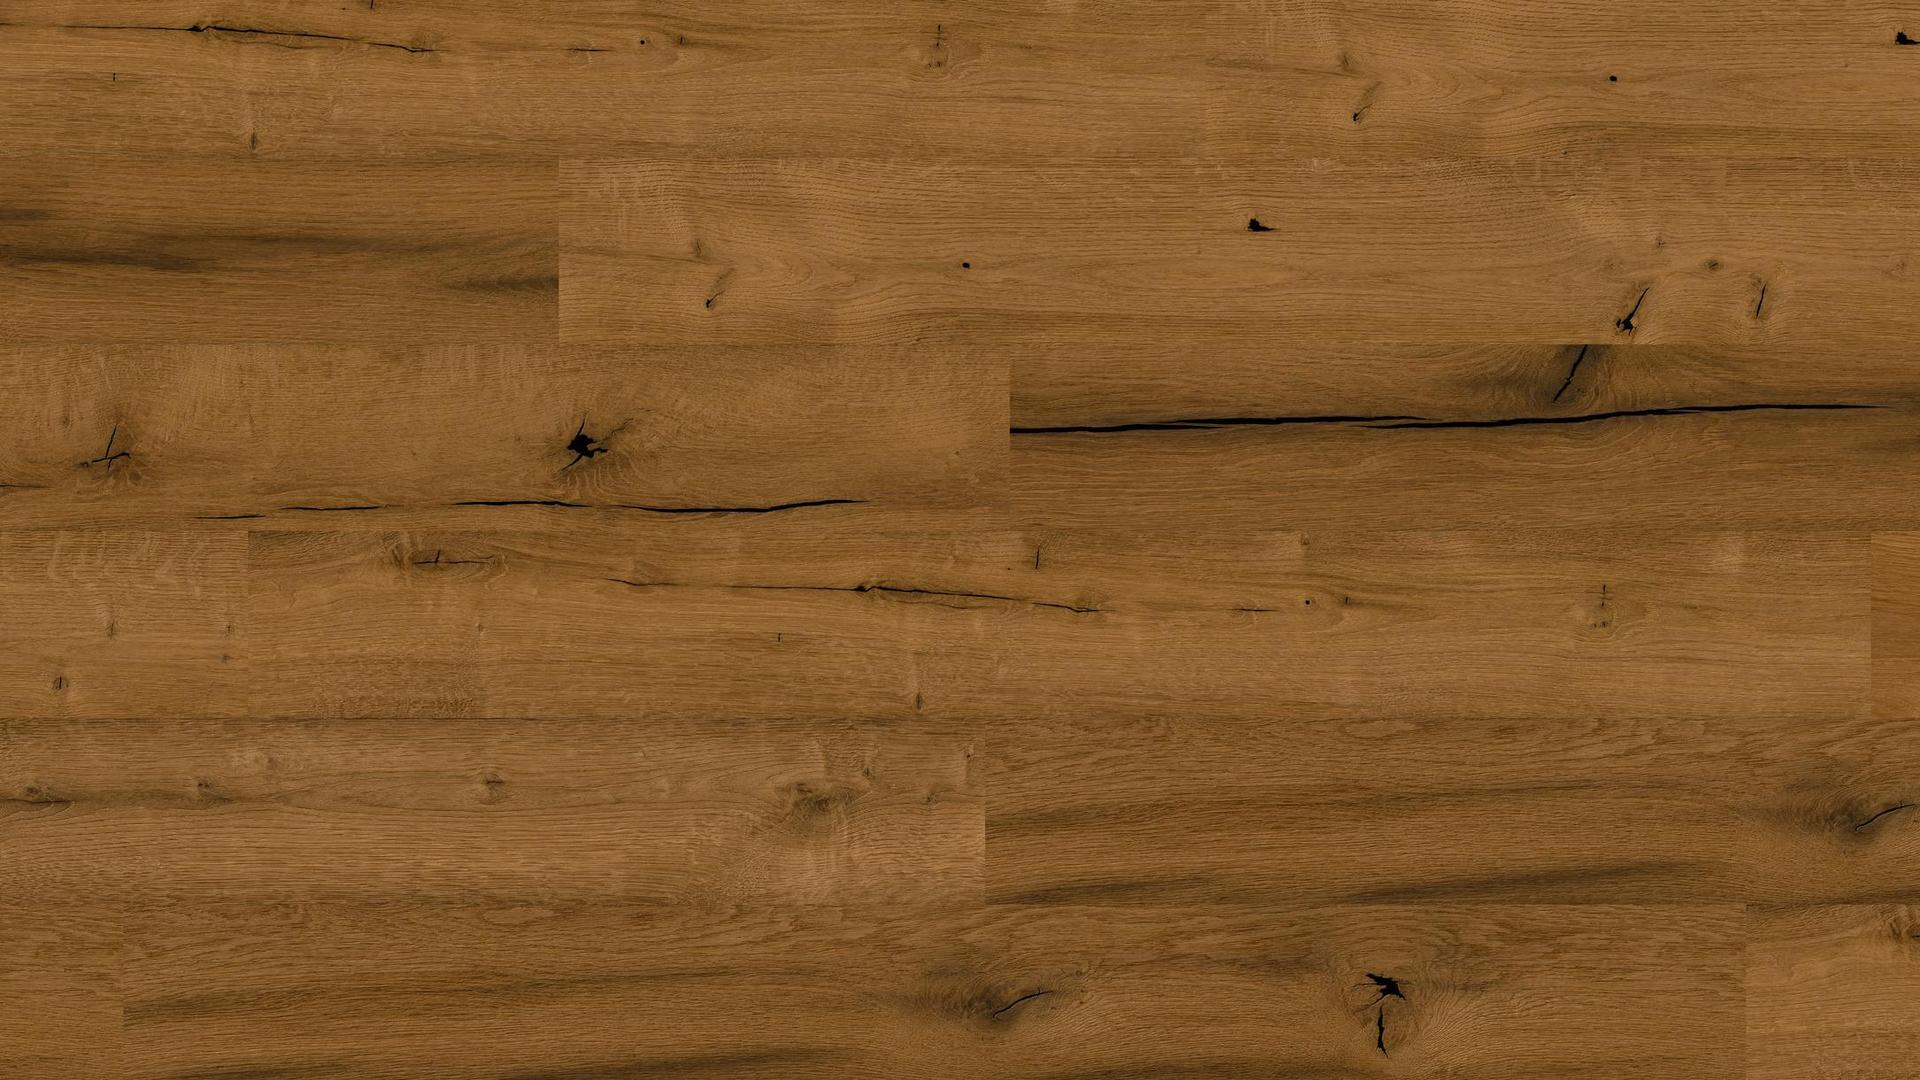 Holzfußboden Eiche ~ O360 eiche karat lm lack matt boden kaindl